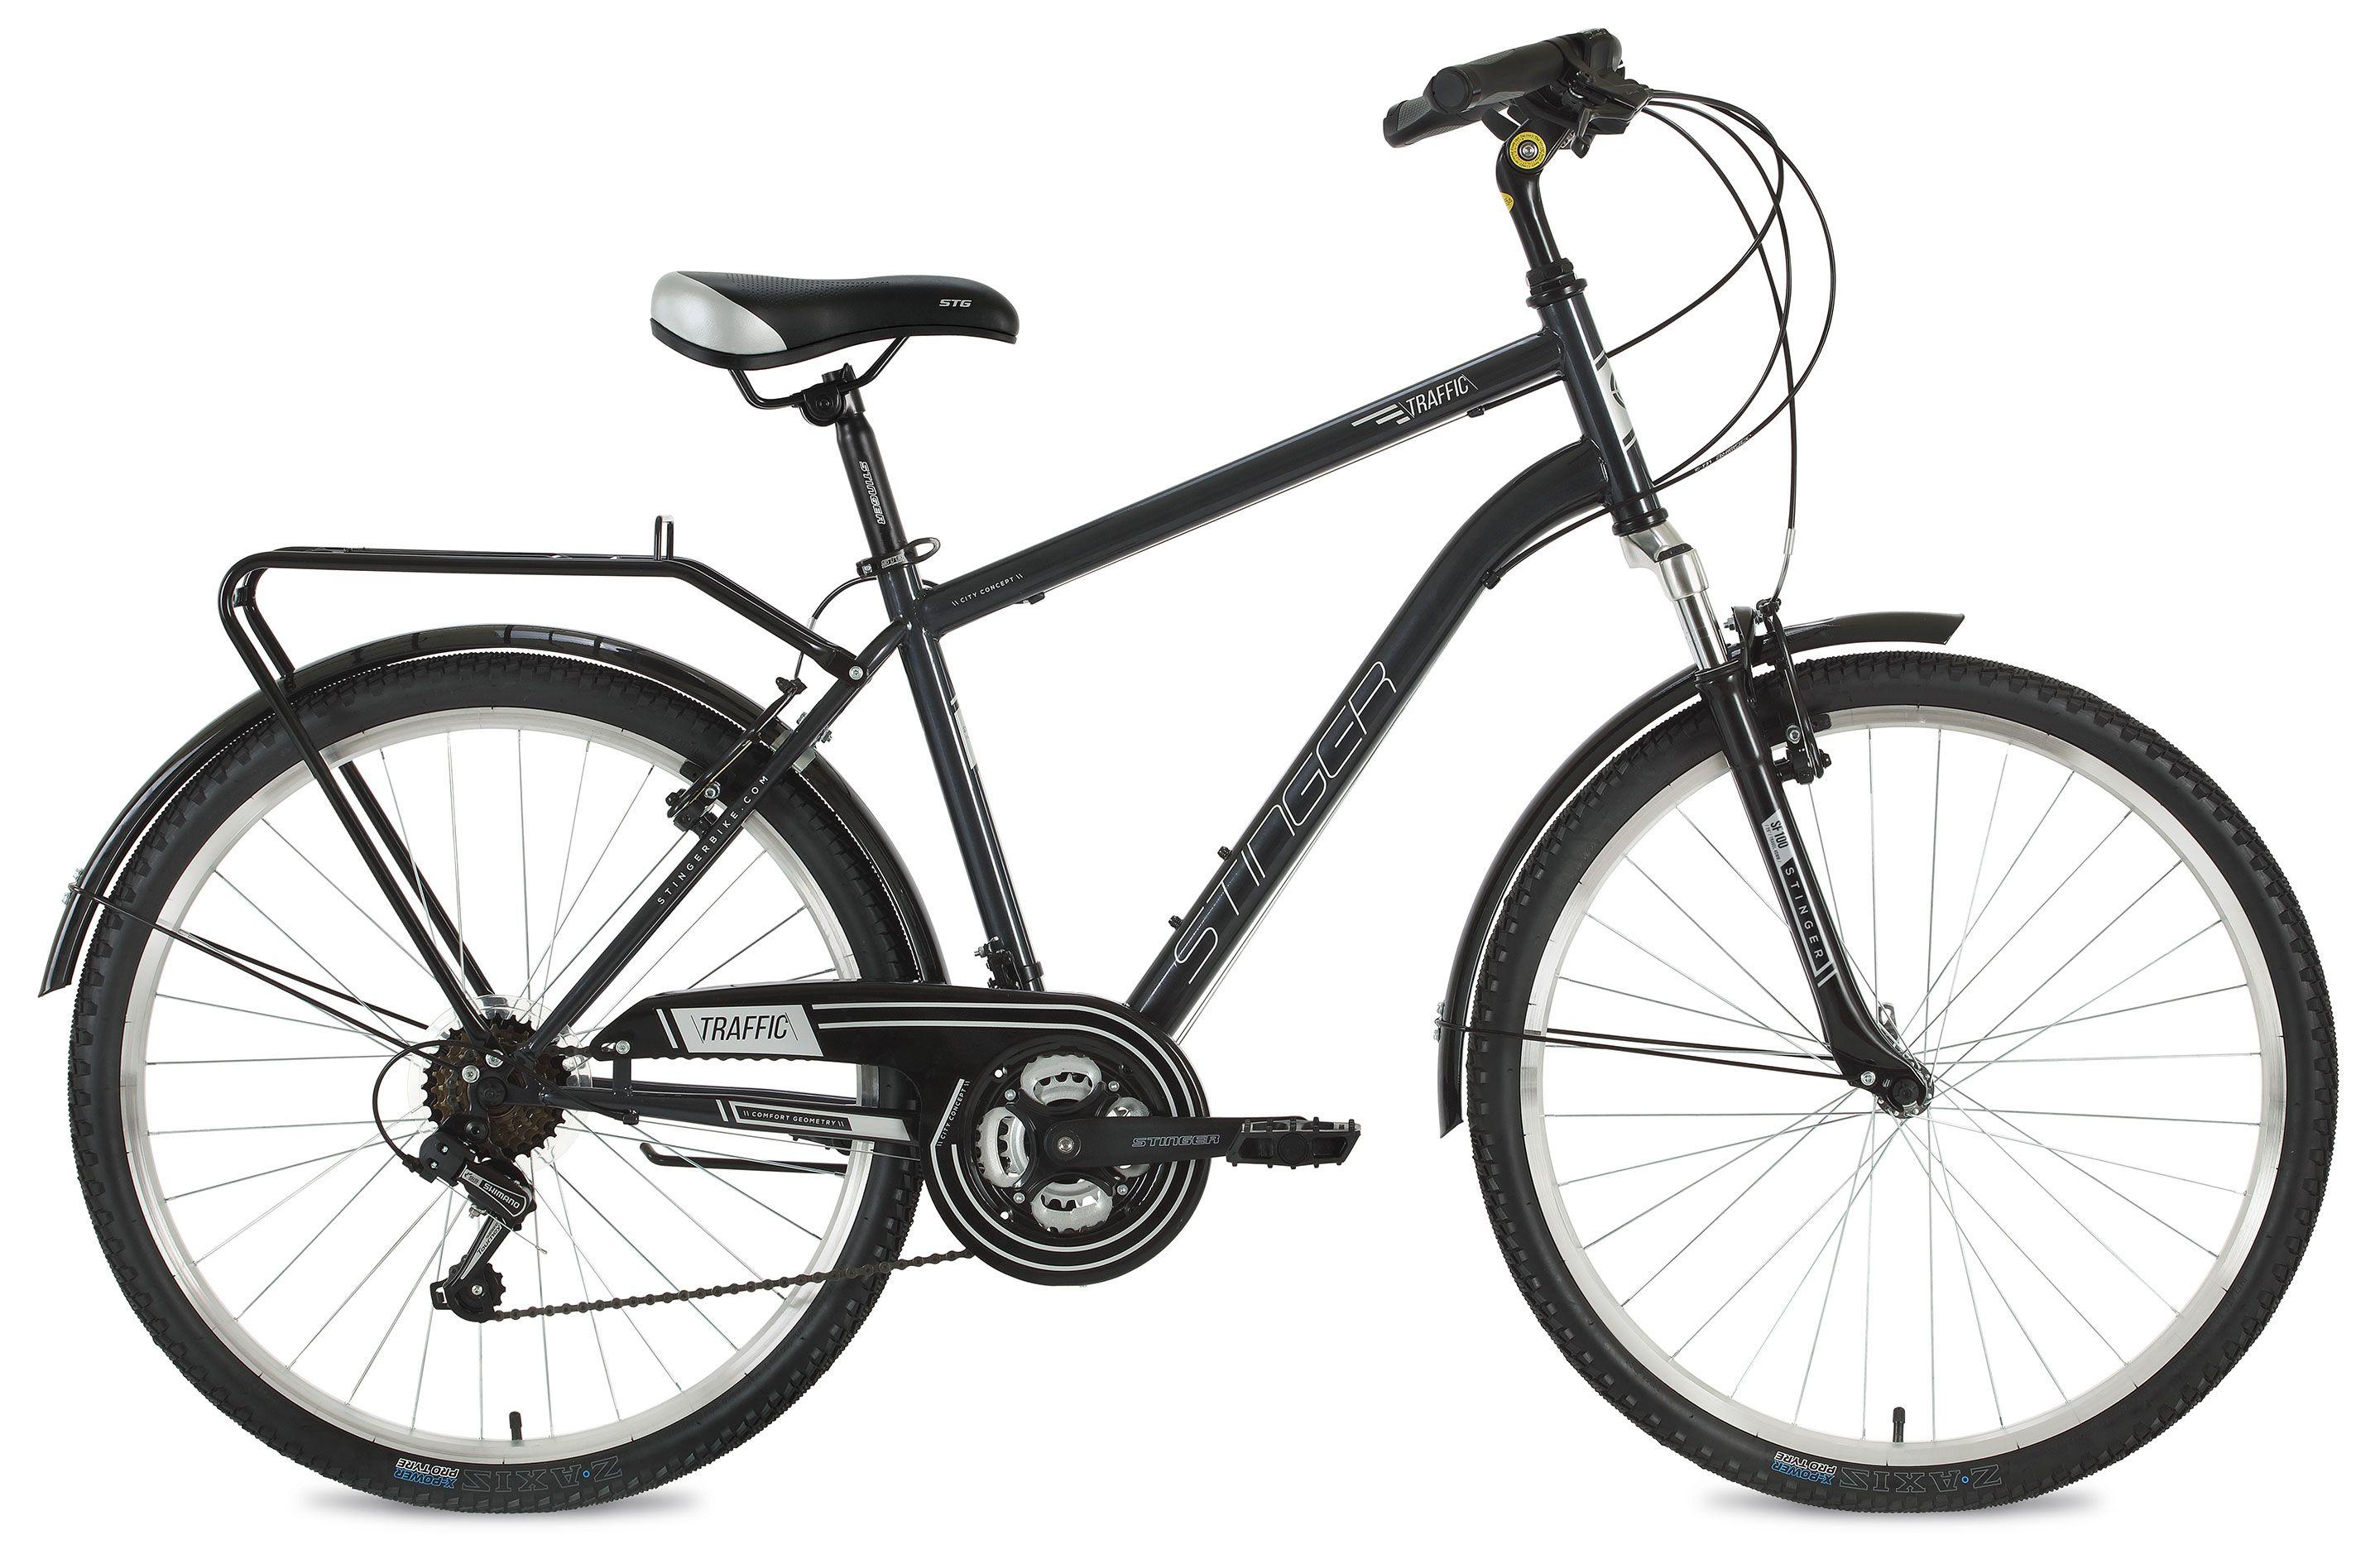 Велосипед Stinger Traffic 26 2018 велосипед stinger cruiser l 26 2016